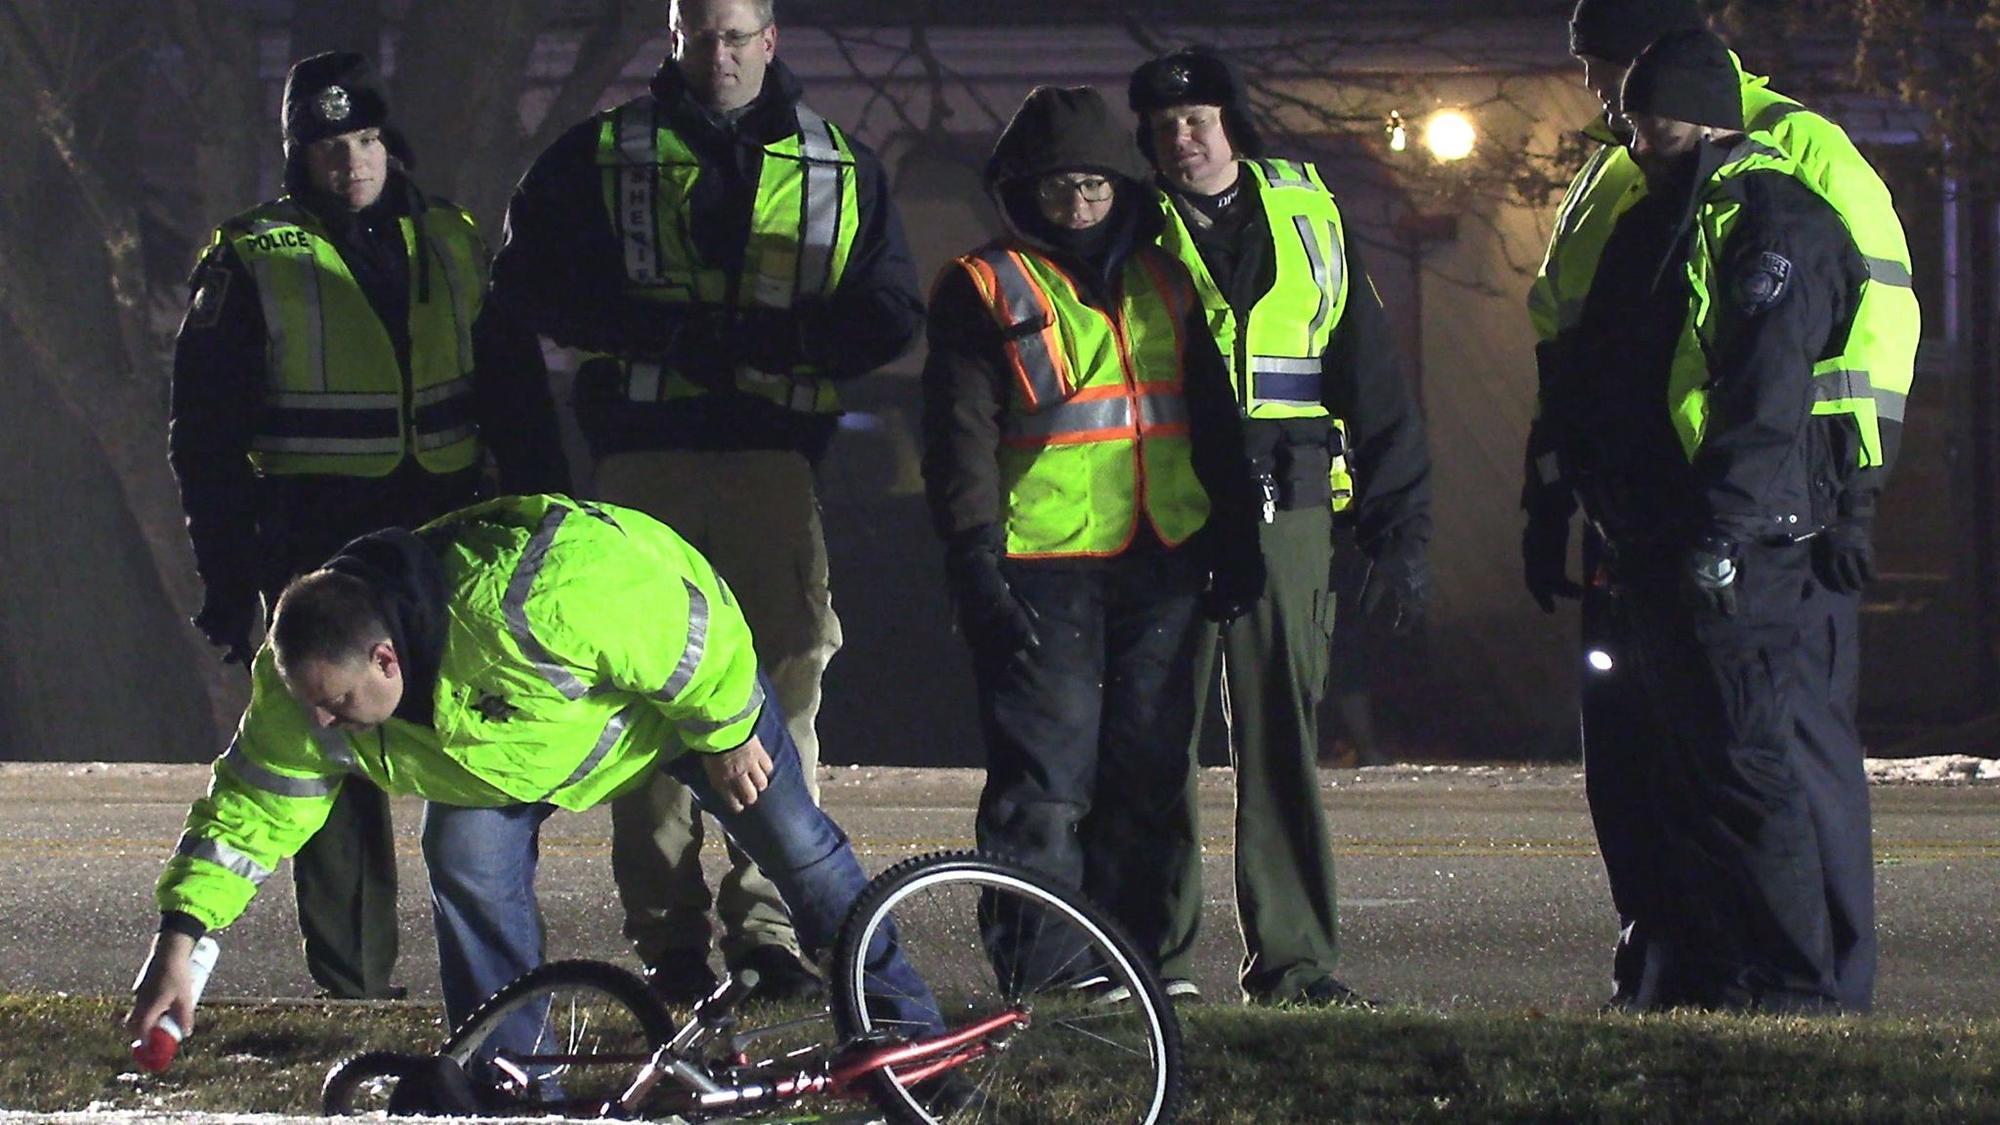 85-year-old bicyclist killed in Mundelein crash: police